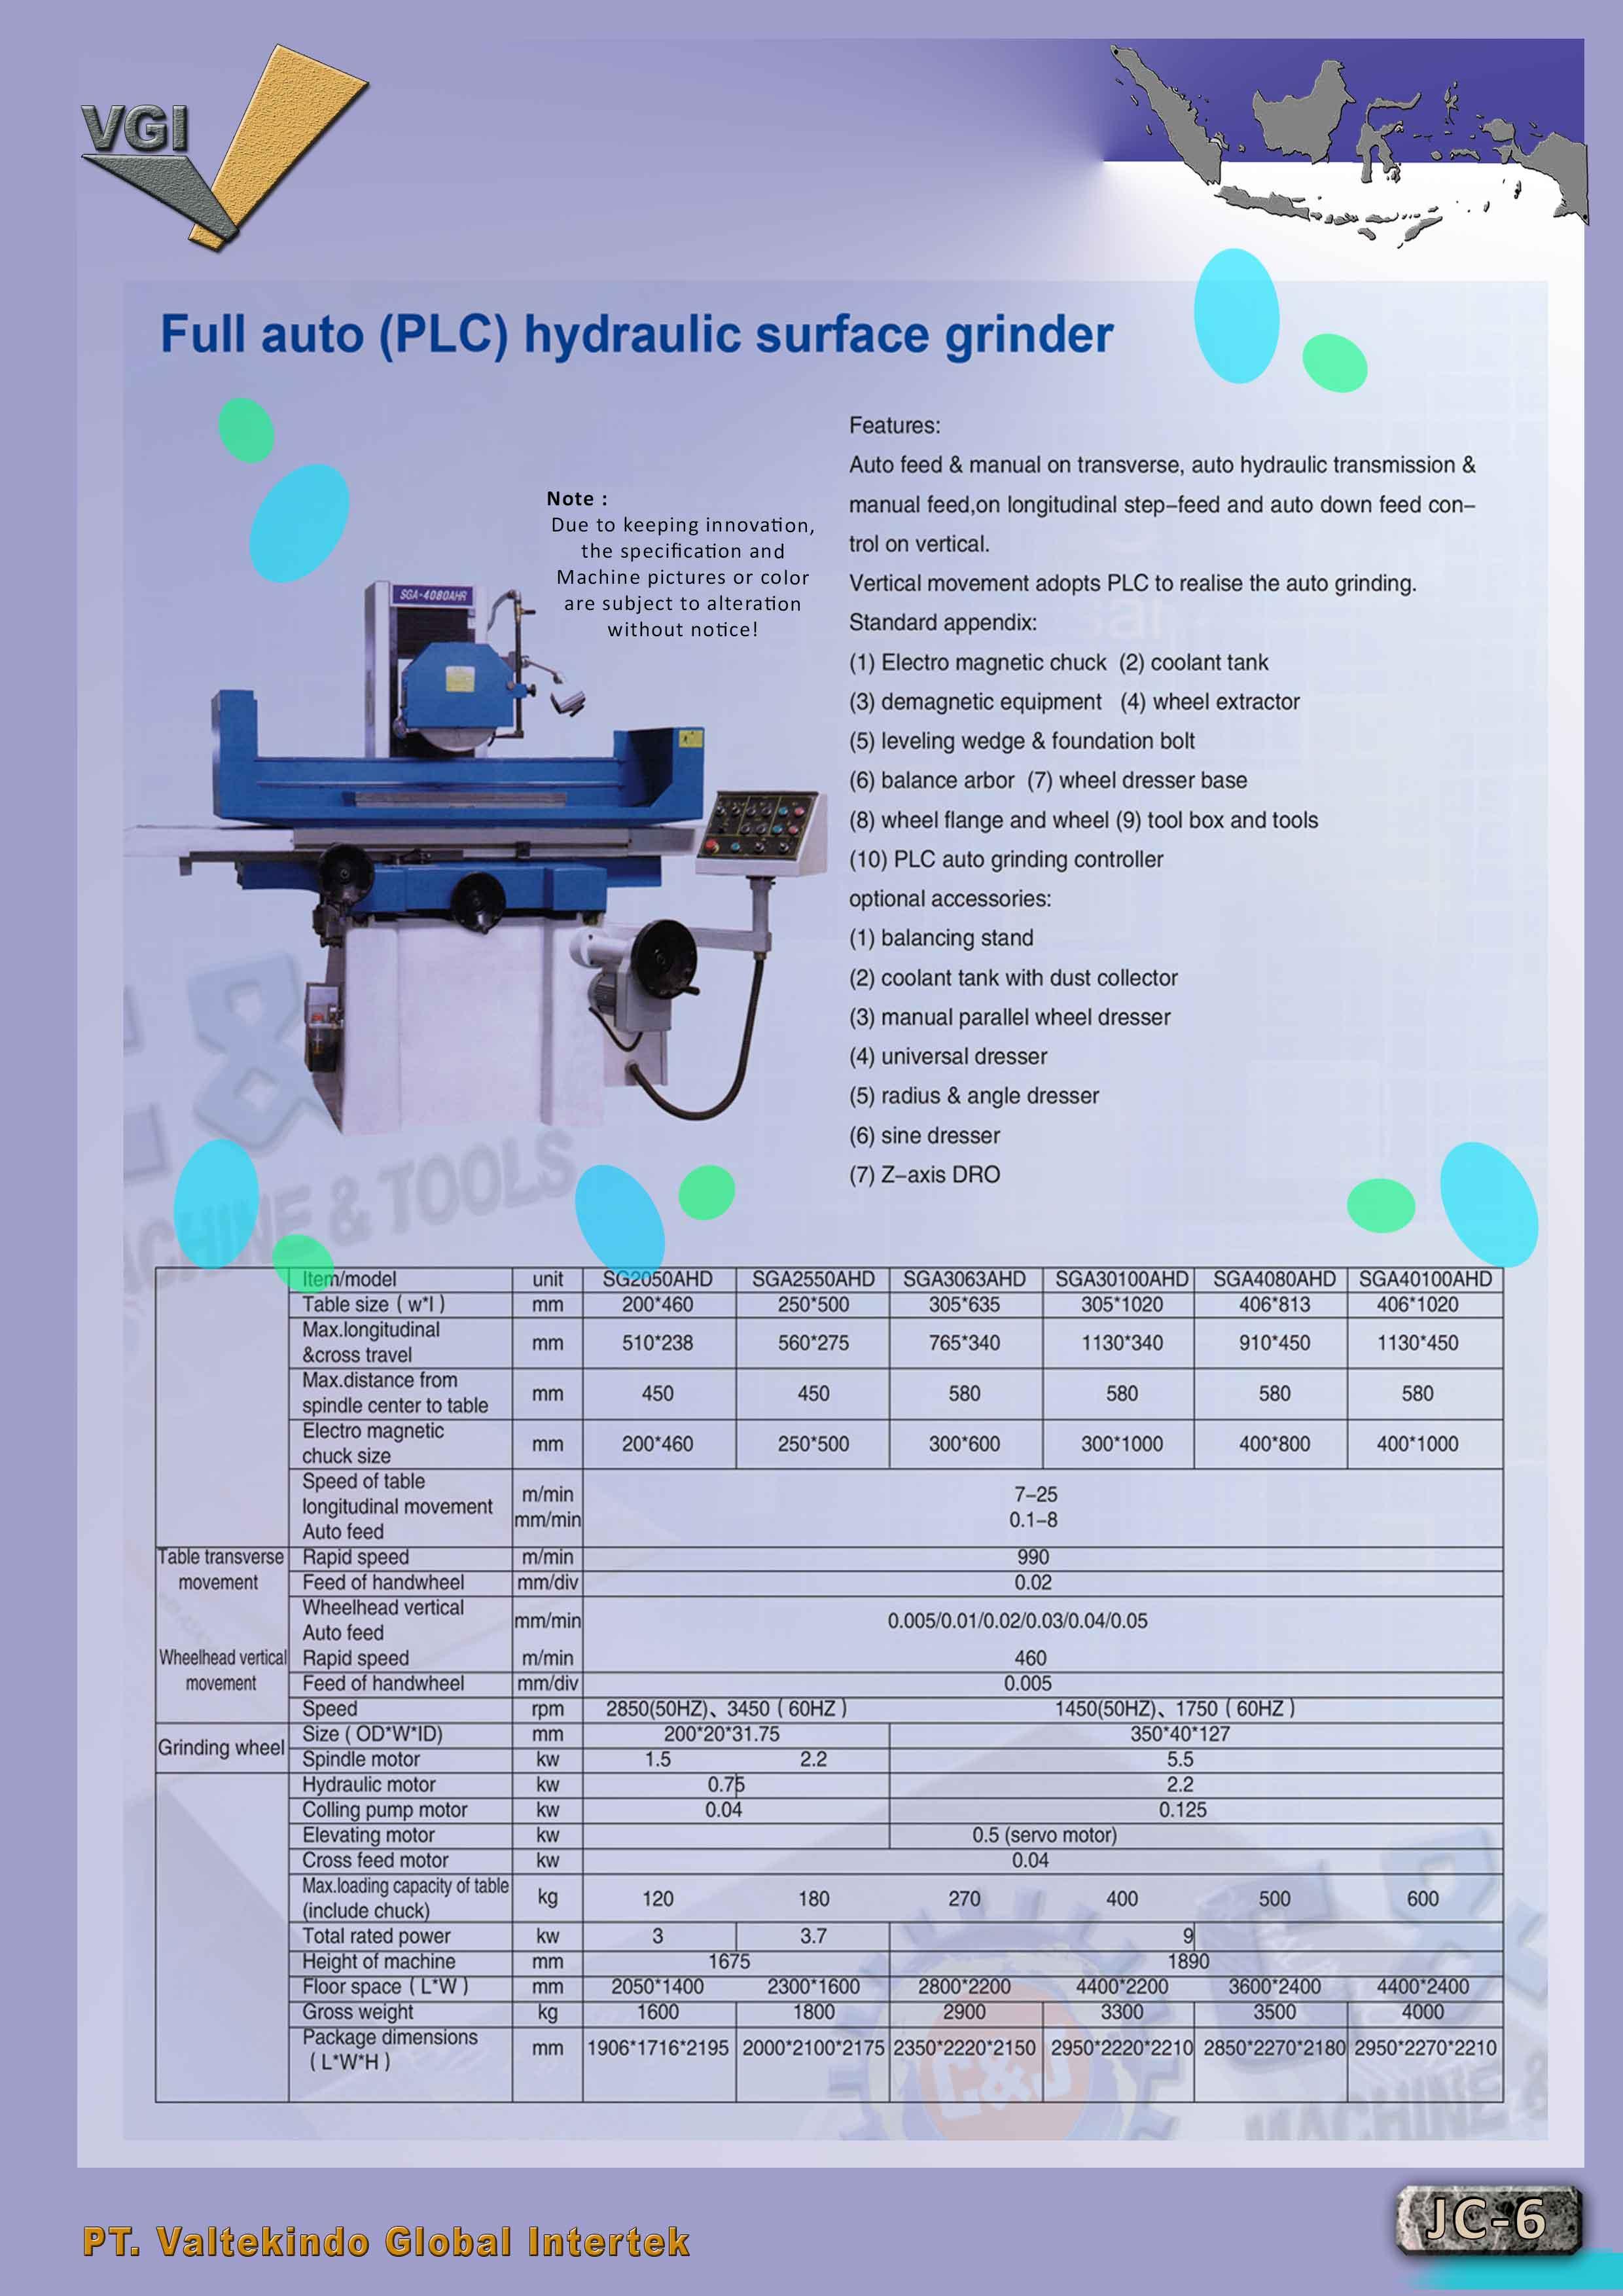 jual mesin Full Auto (PLC) Hydraulic Surface Grinder